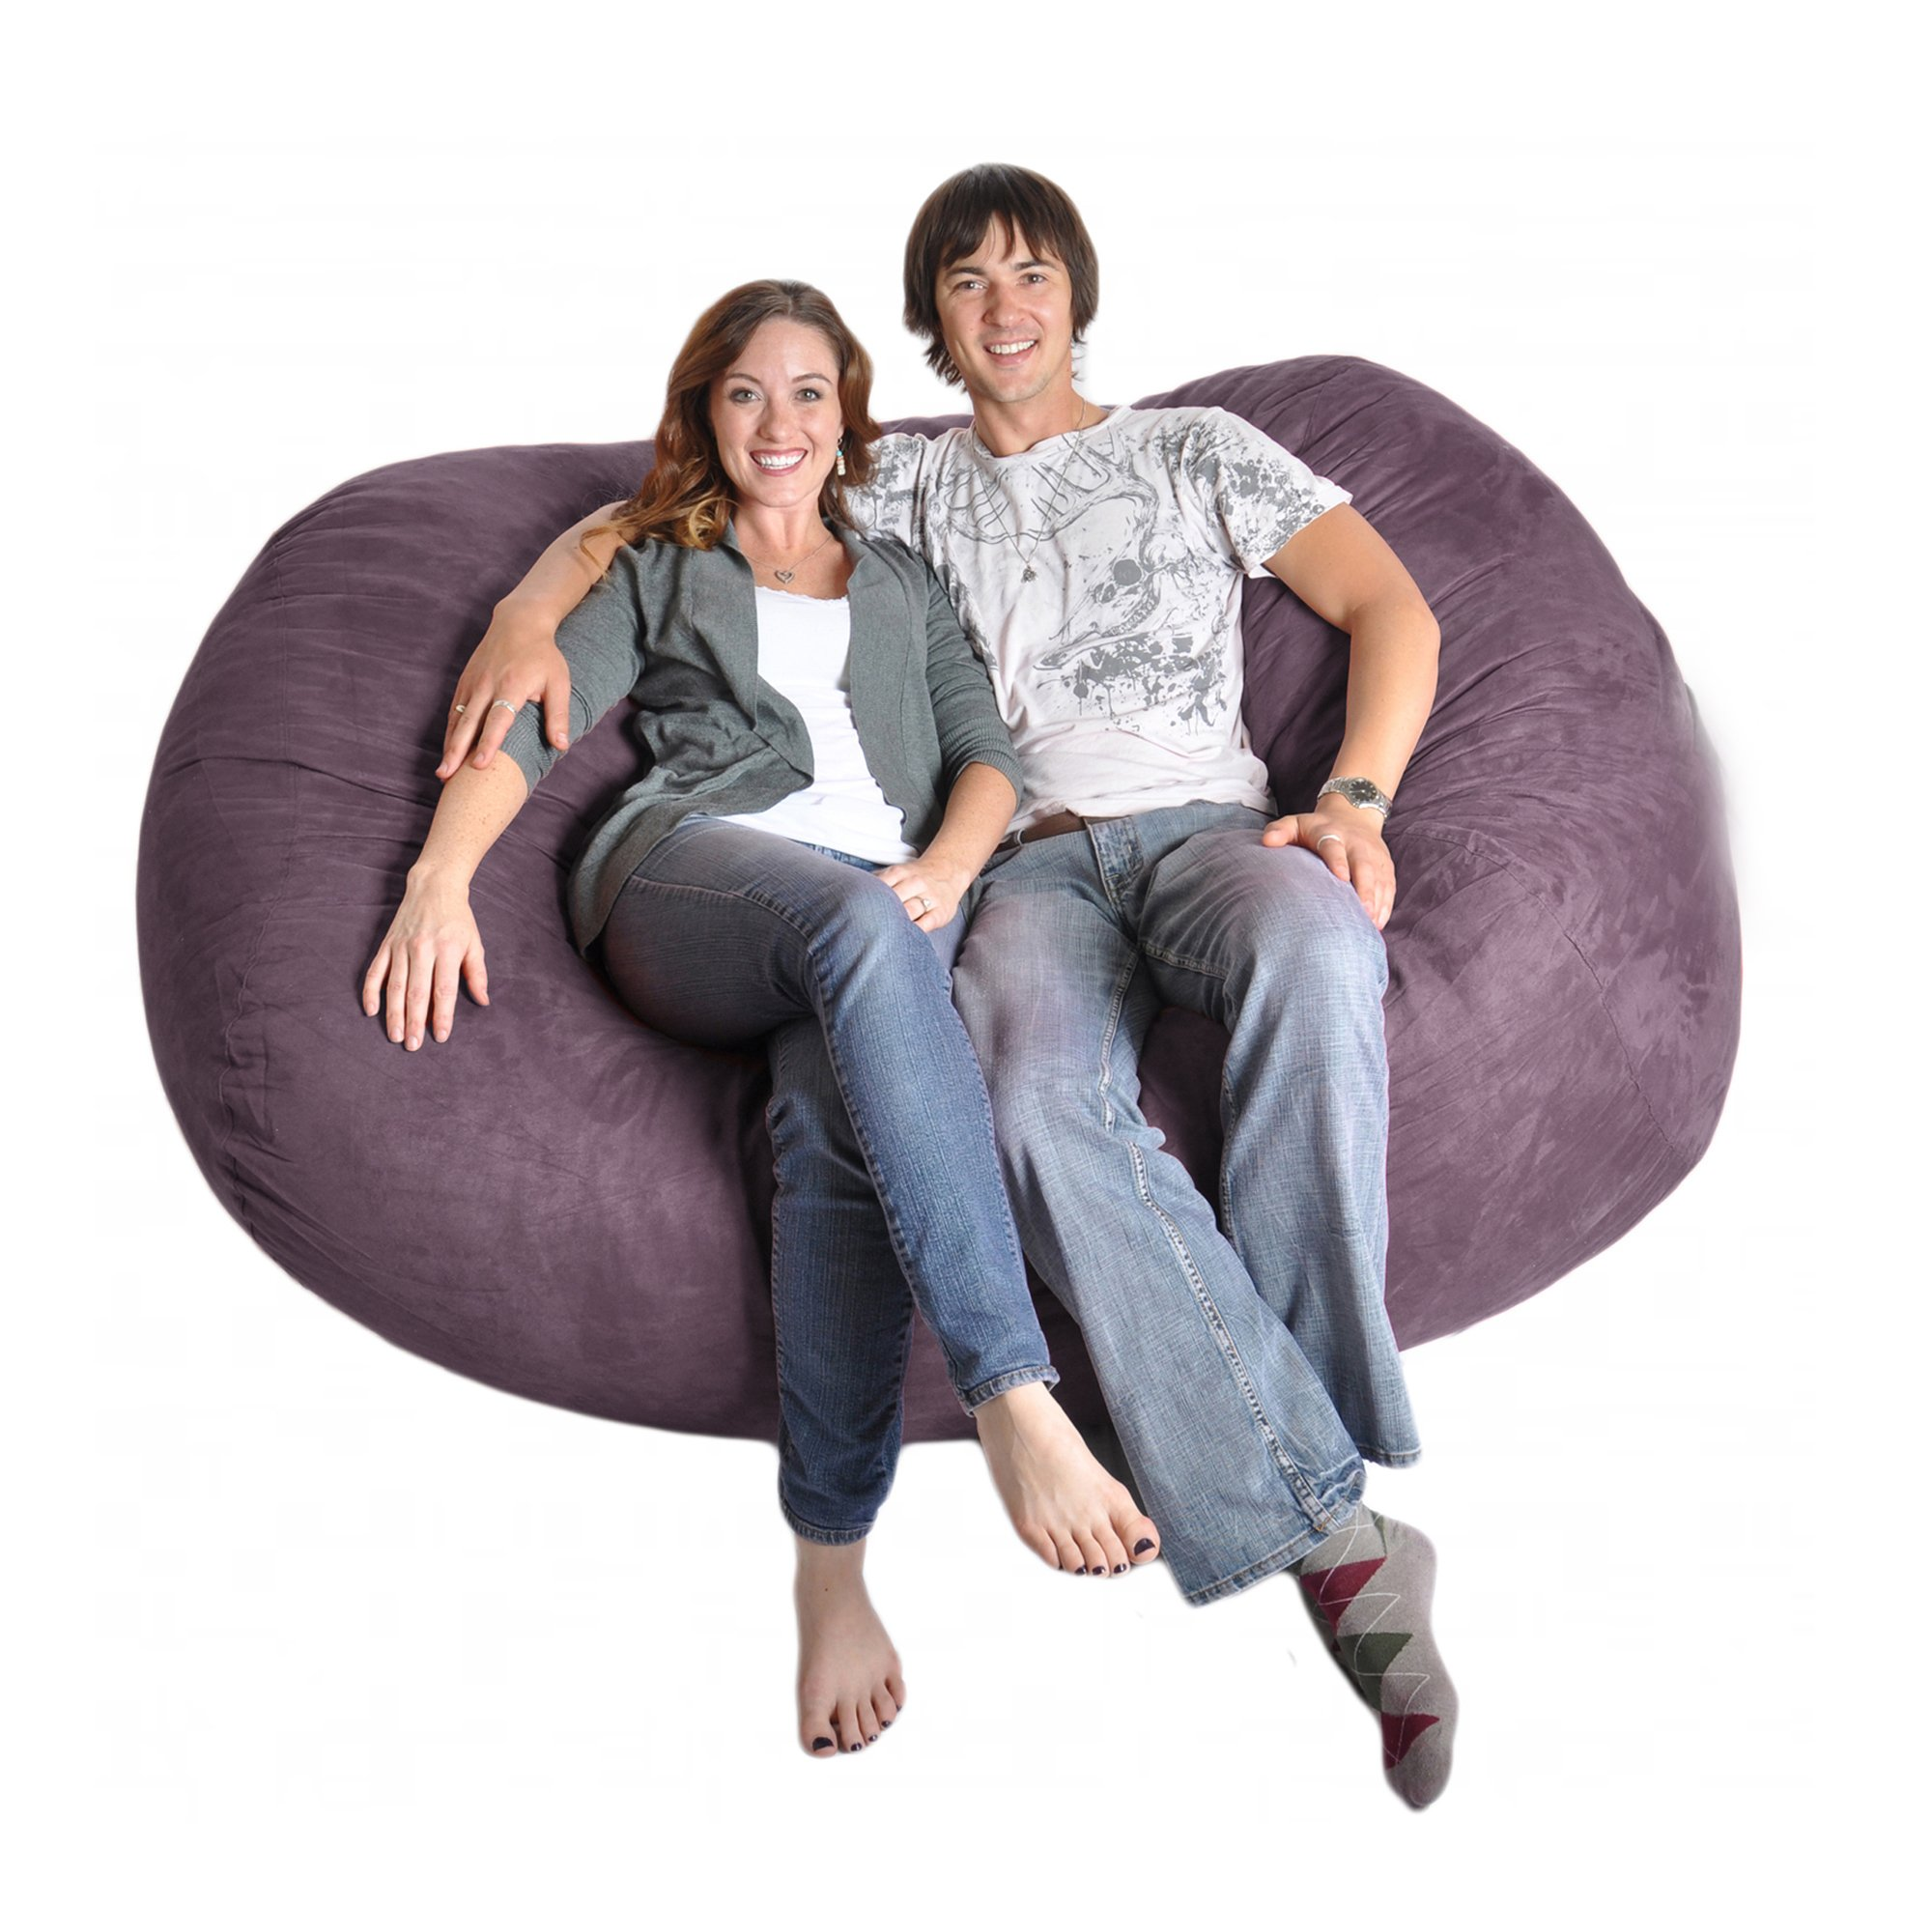 SLACKER sack 6 Foot Extra Large Foam Microsuede Beanbag for Girls, Purple